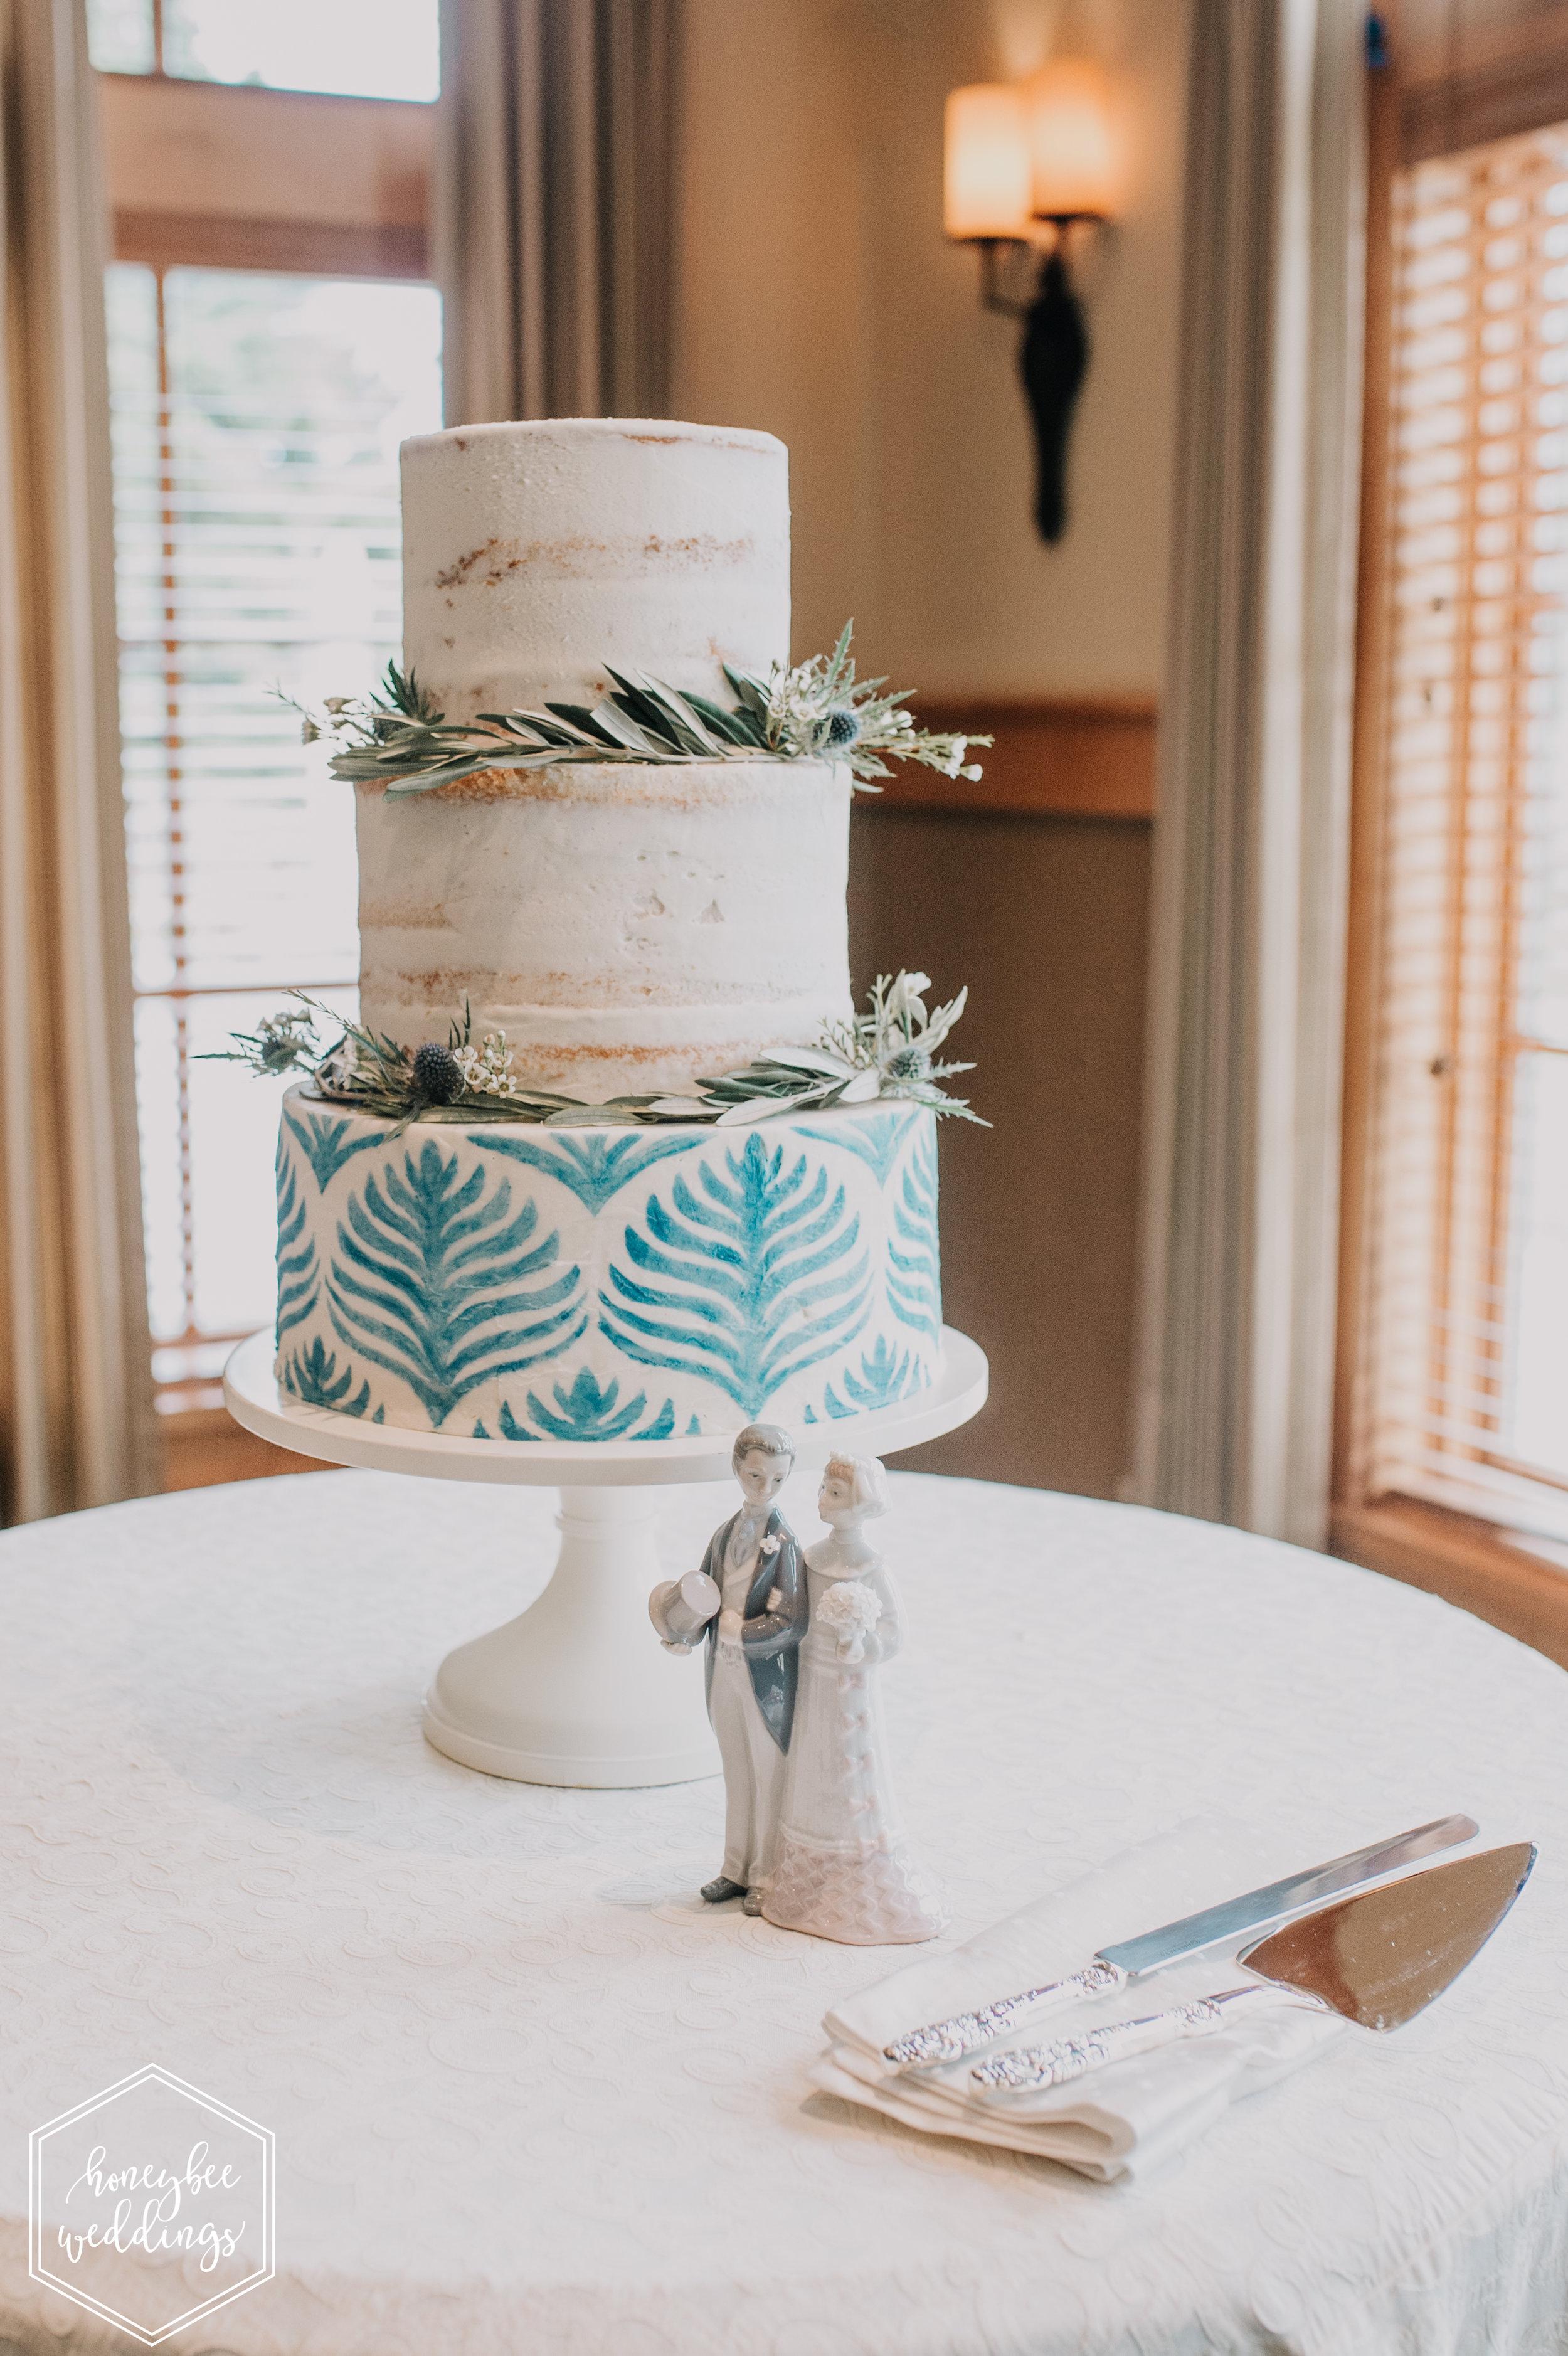 427 Riverside Country Club Wedding_Montana Wedding Photographer_Lauren Jackson + Evan Ivaldi 2018-7991.jpg